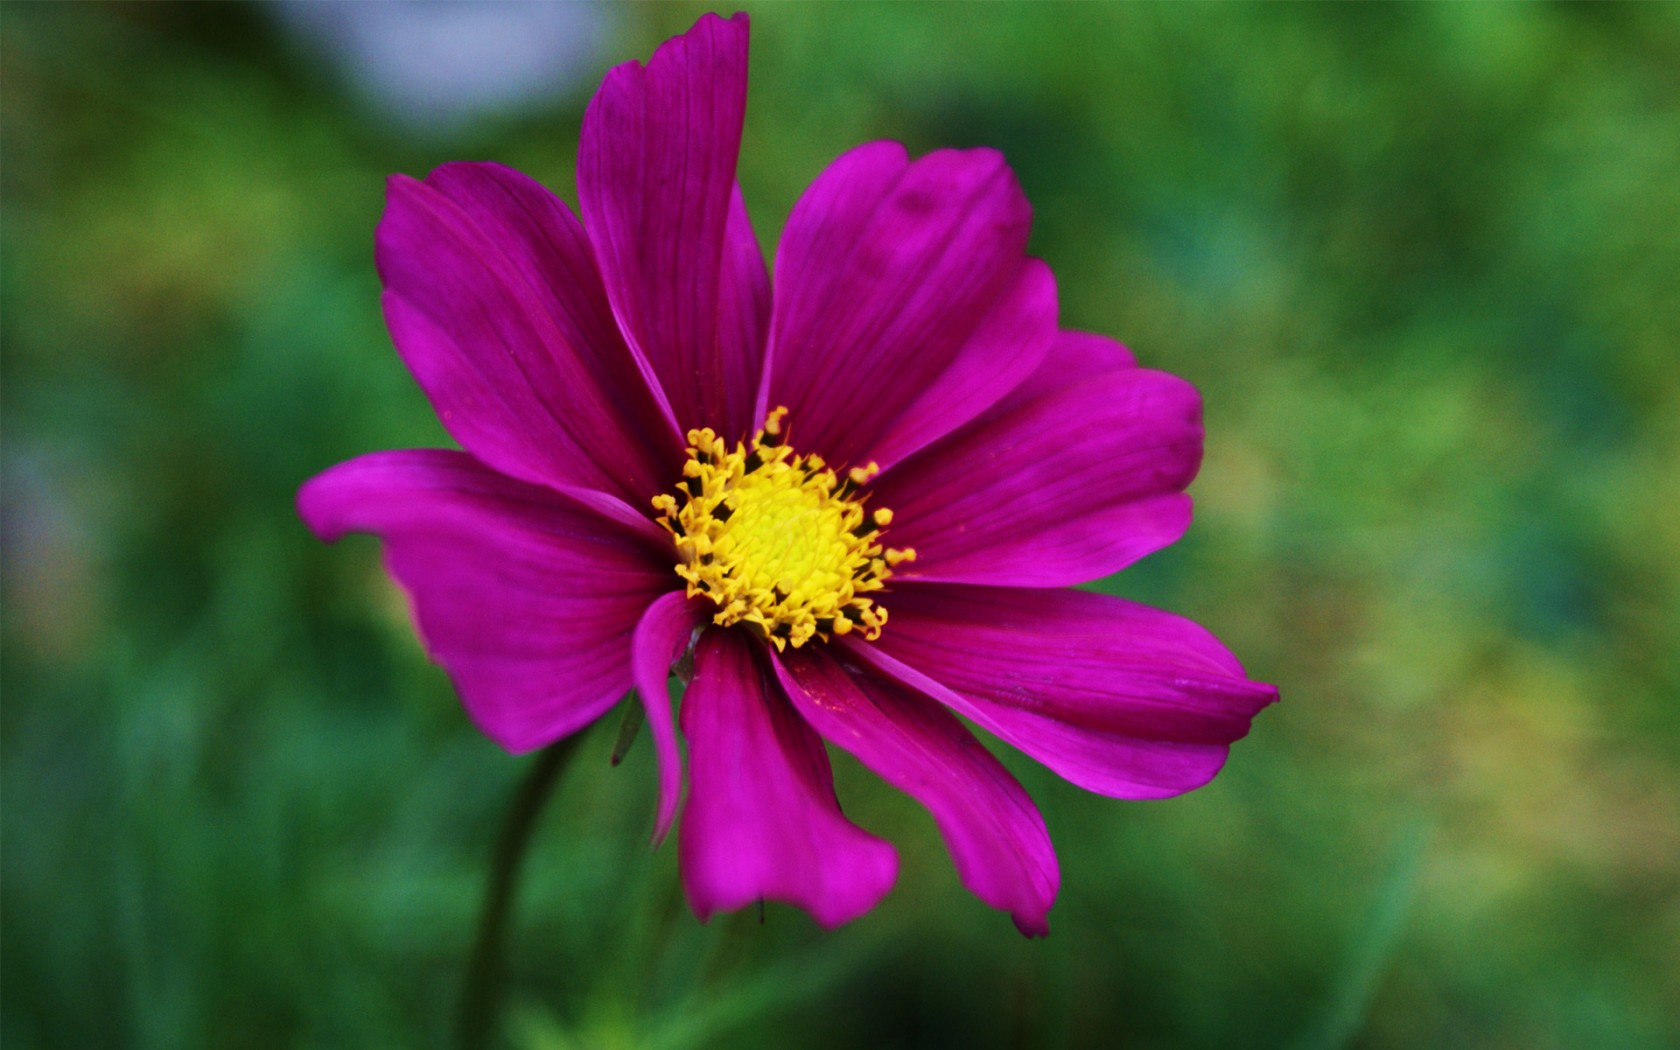 Фото клипарт – Луга, цветы, лето (76 ...: nevsepic.com.ua/ostalnoe-bez-razdela/page,2,20600-foto-klipart-luga...